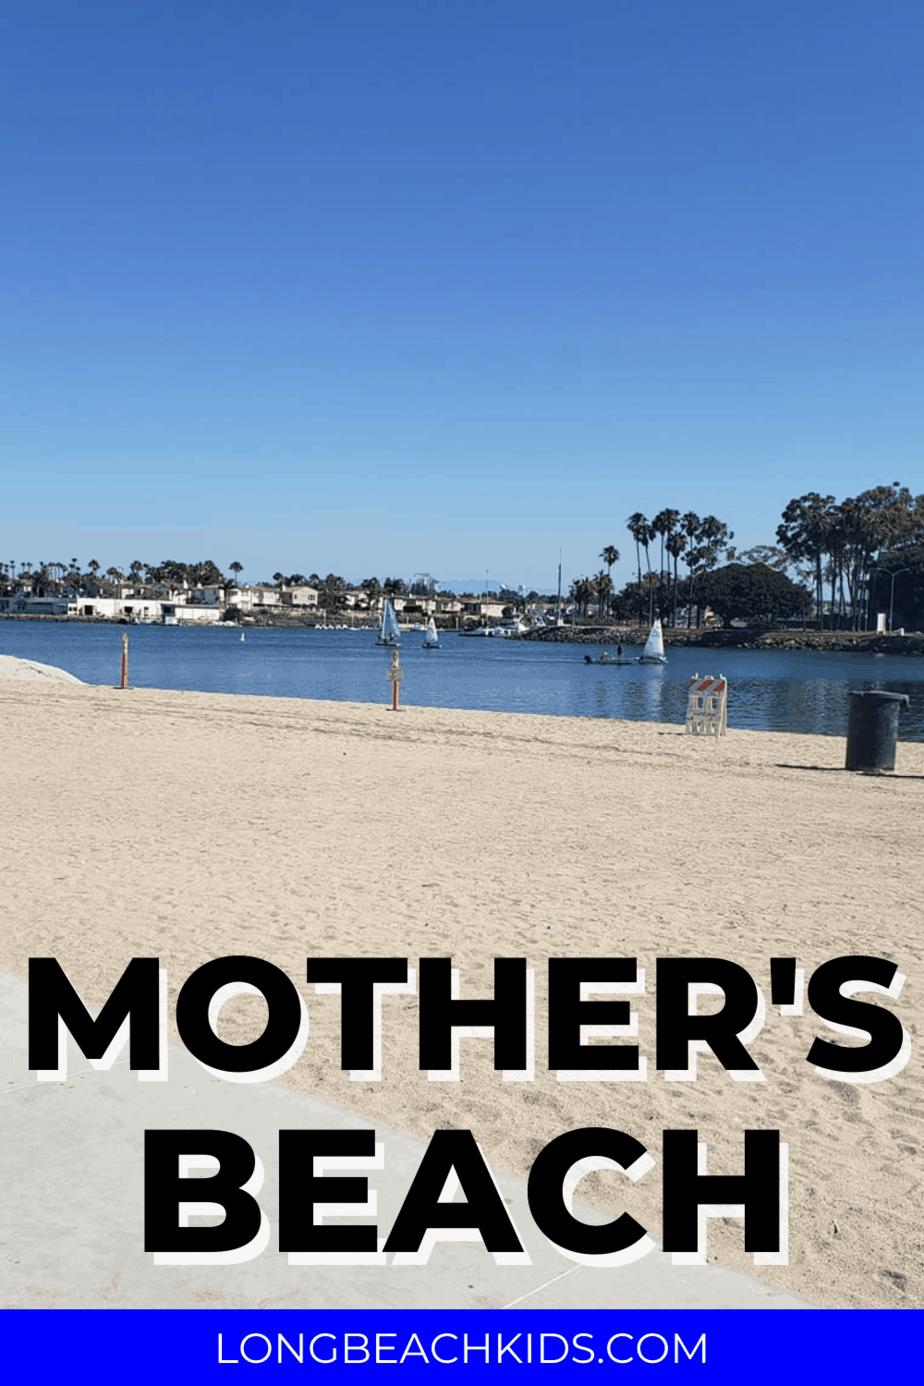 a calm sandy beach; text: mother's beach